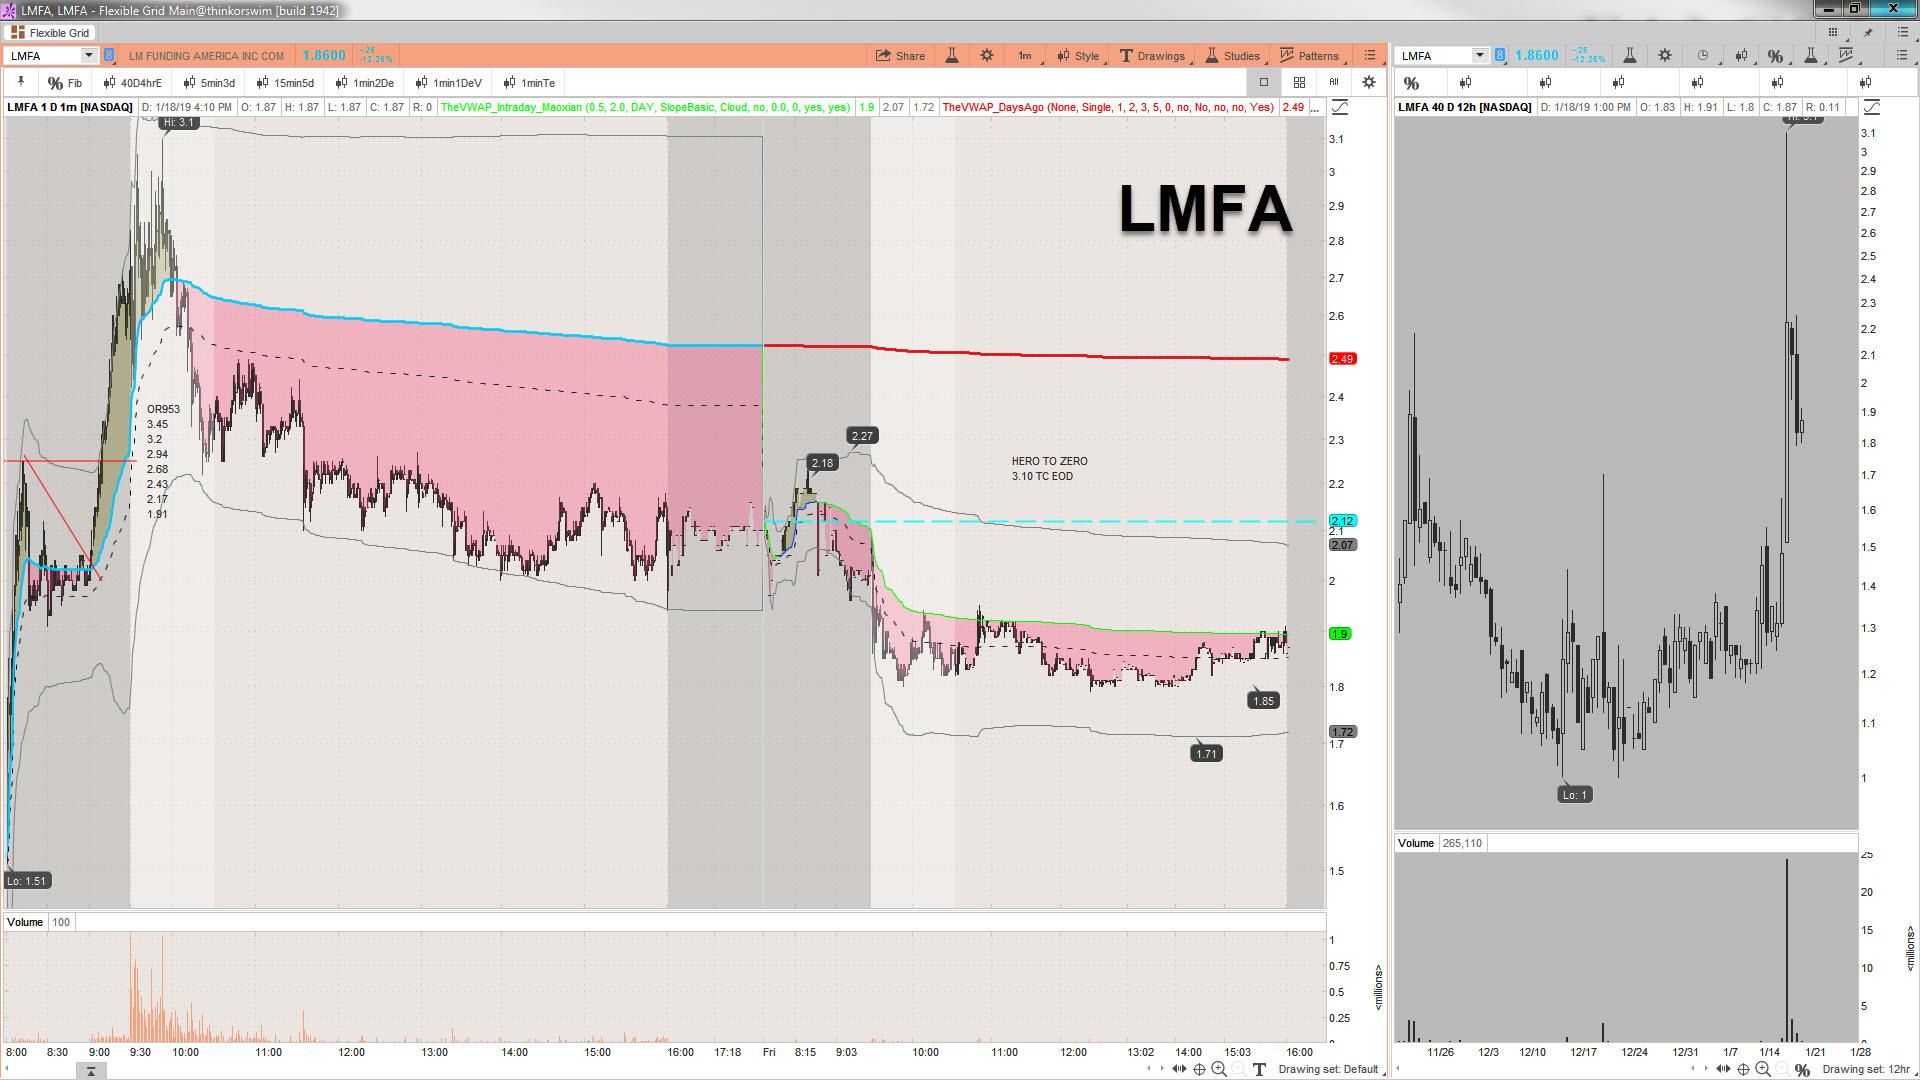 2019-01-18_16-15-28 LMFA.jpg